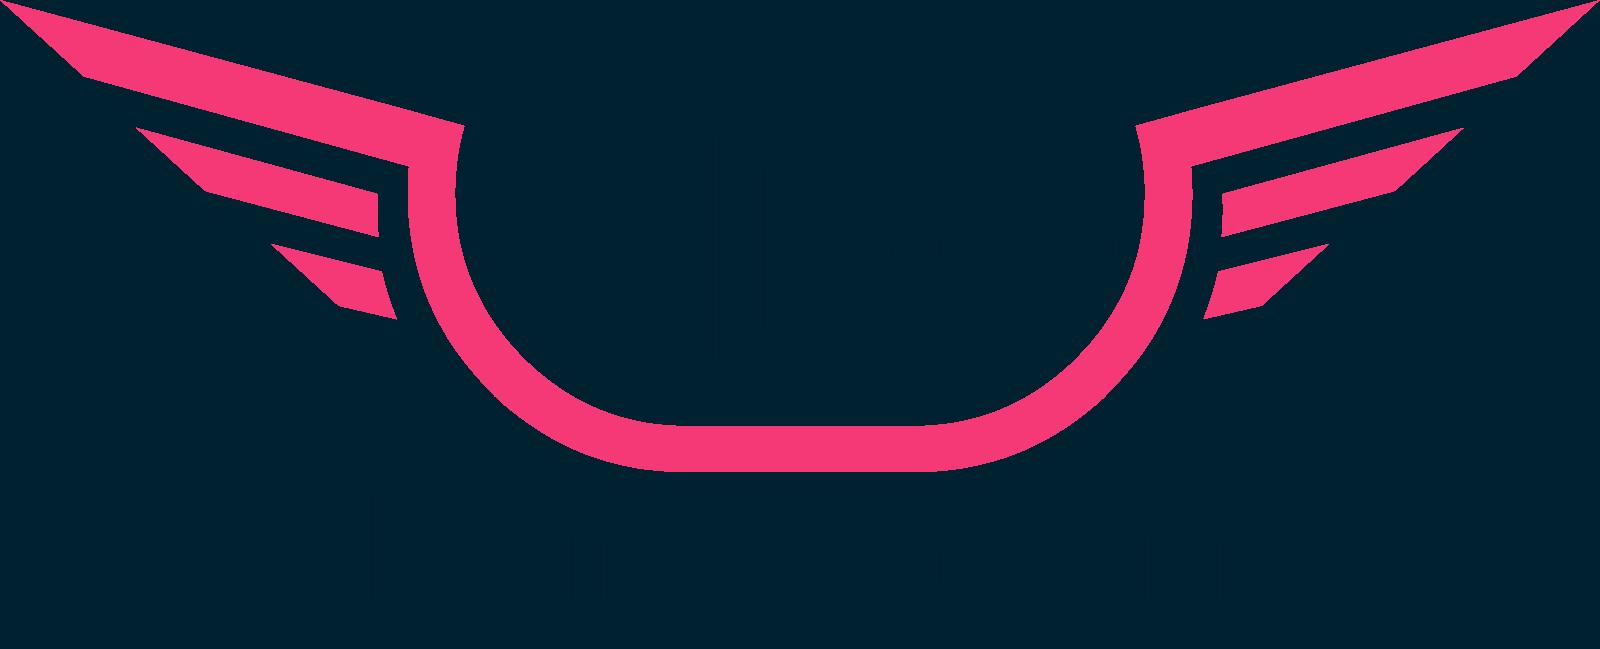 SEO Bandwagon logo